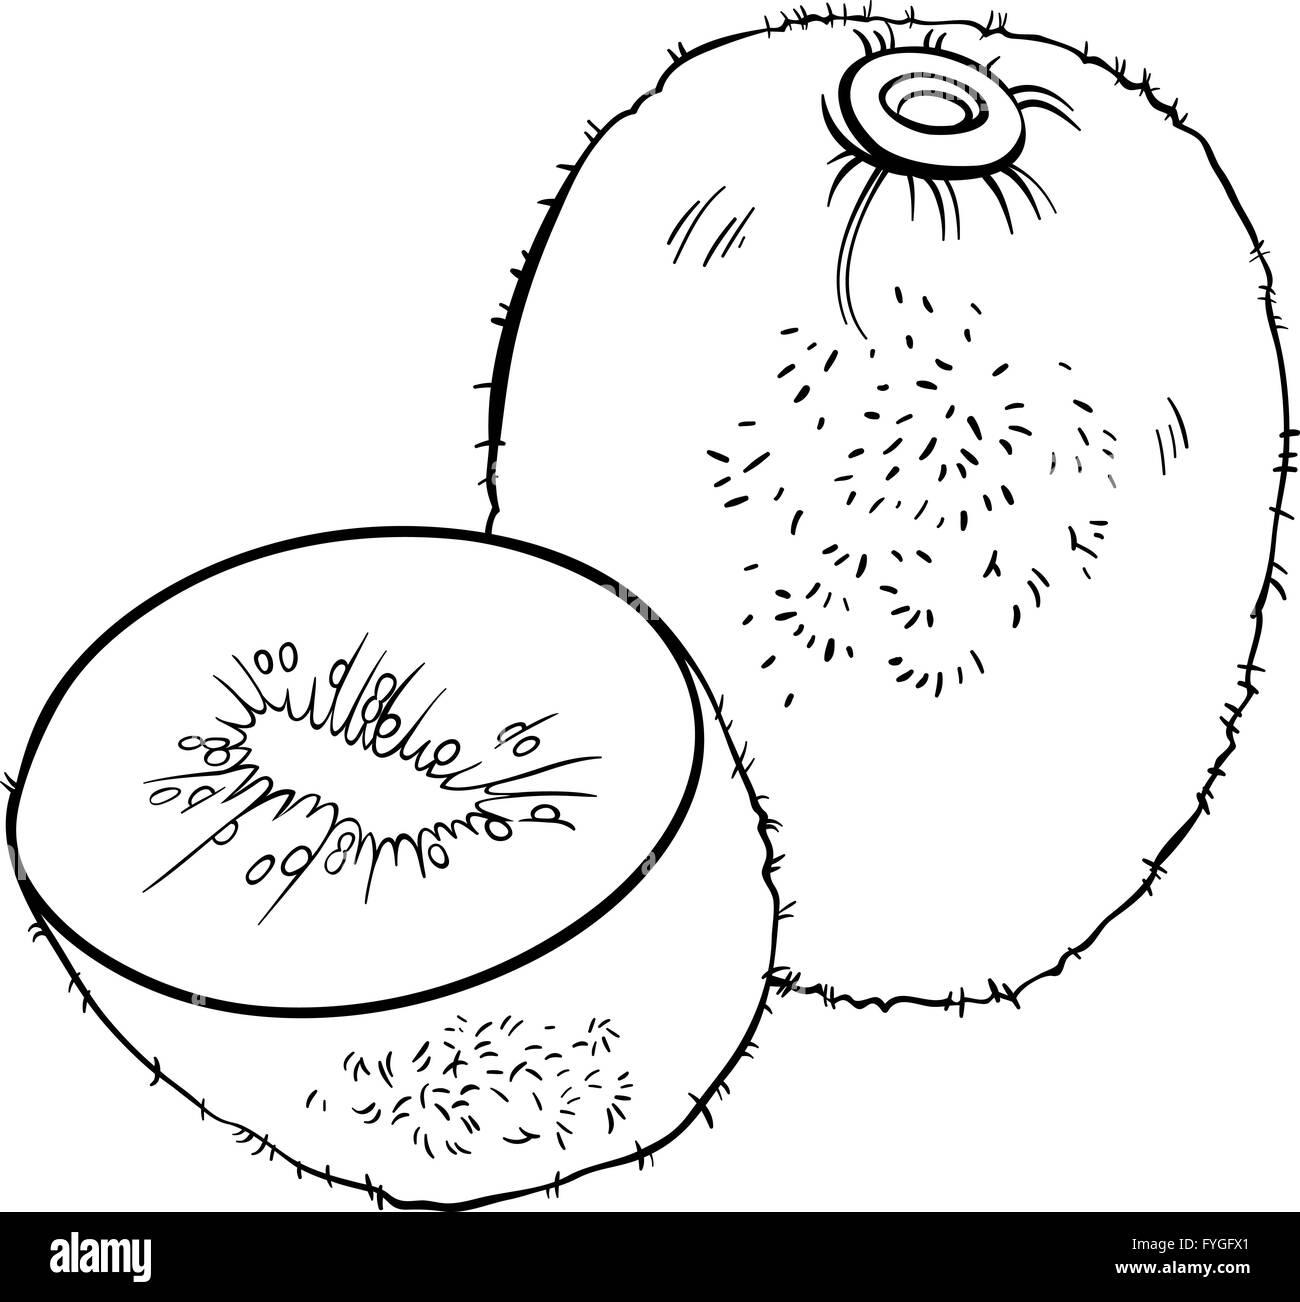 Kiwi fruit illustration for coloring book